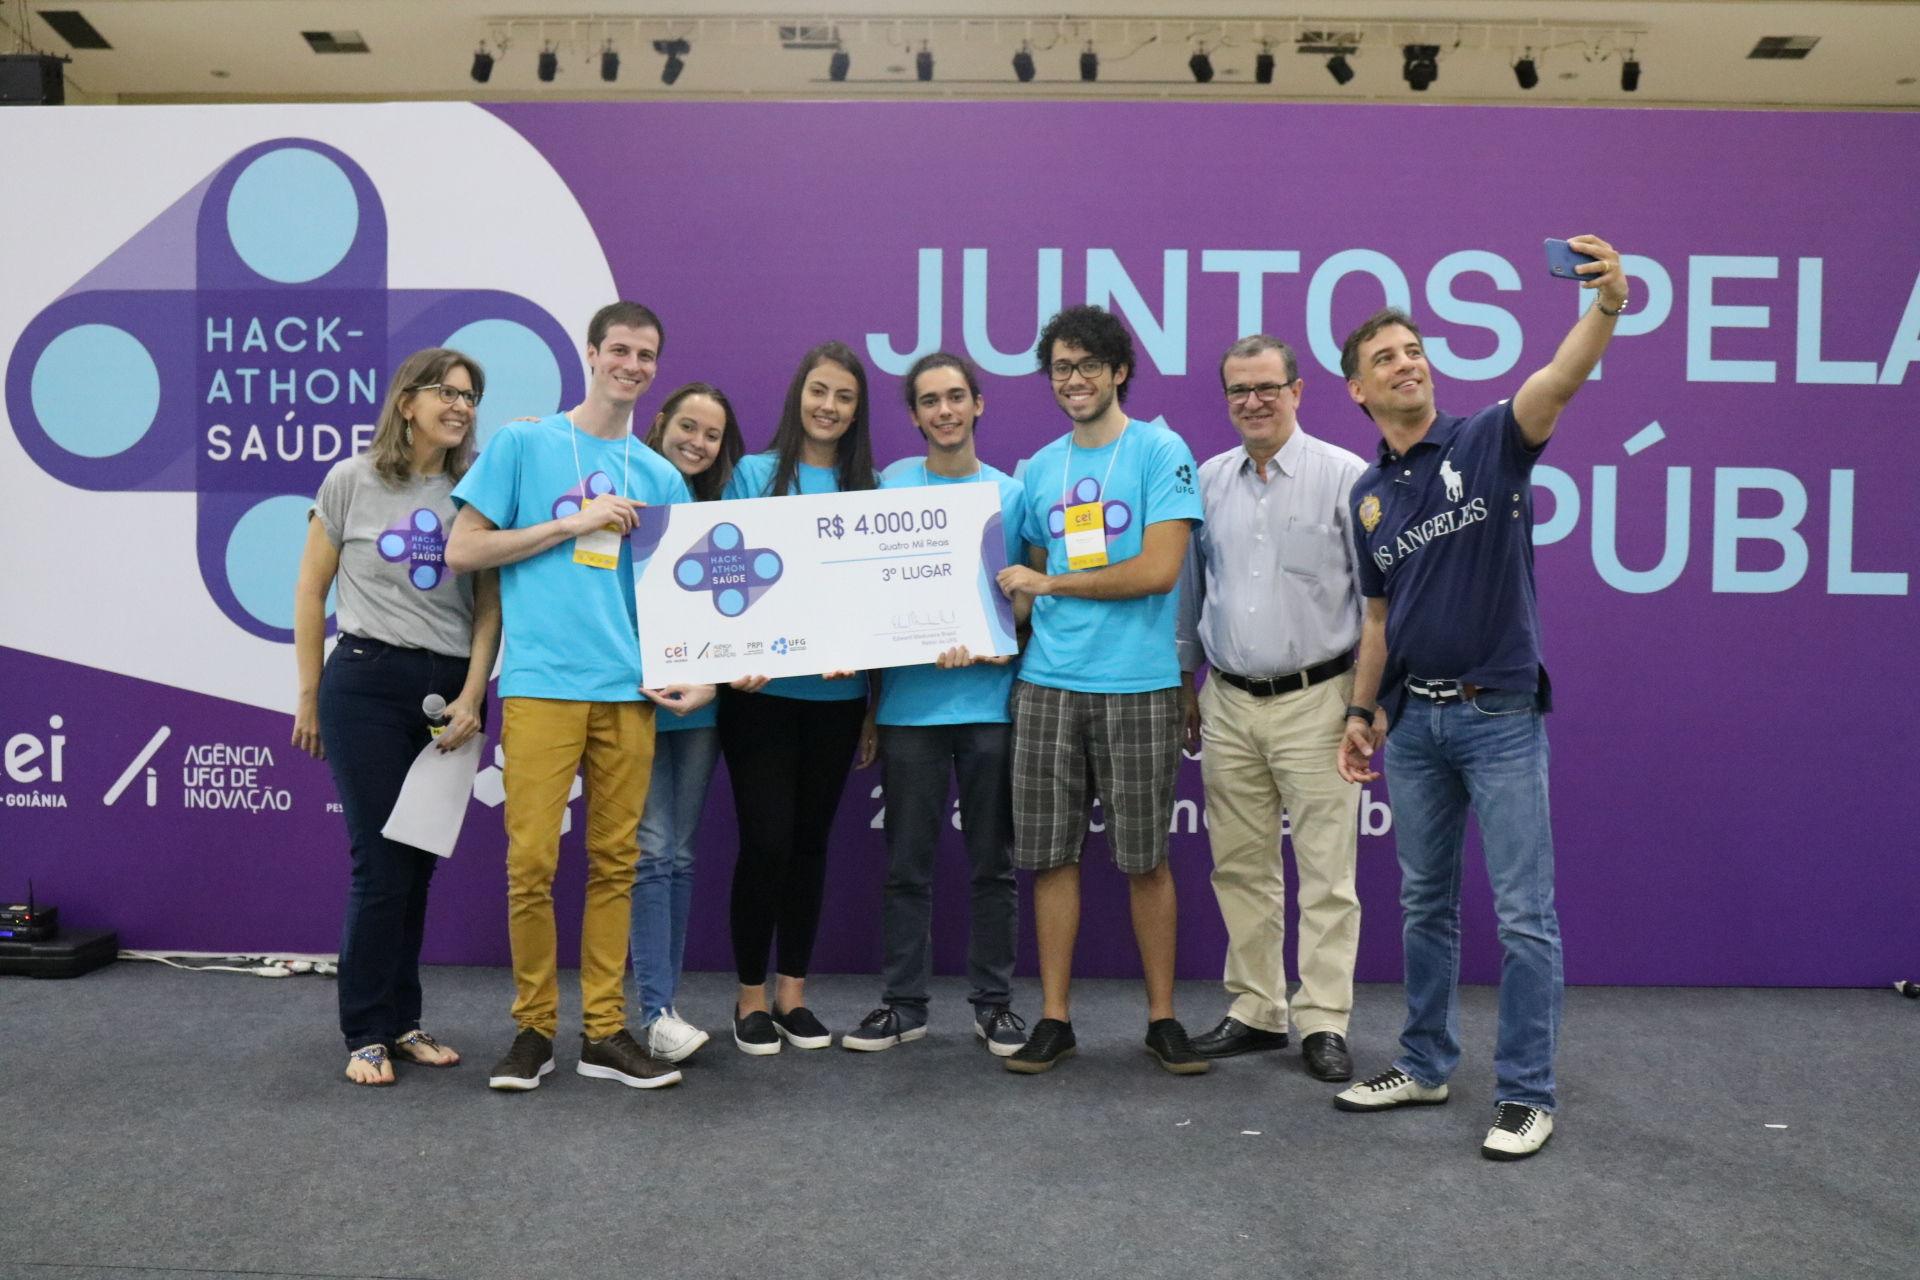 Equipe Sang.in - terceiro lugar 1º Hackathon em Saúde UFG